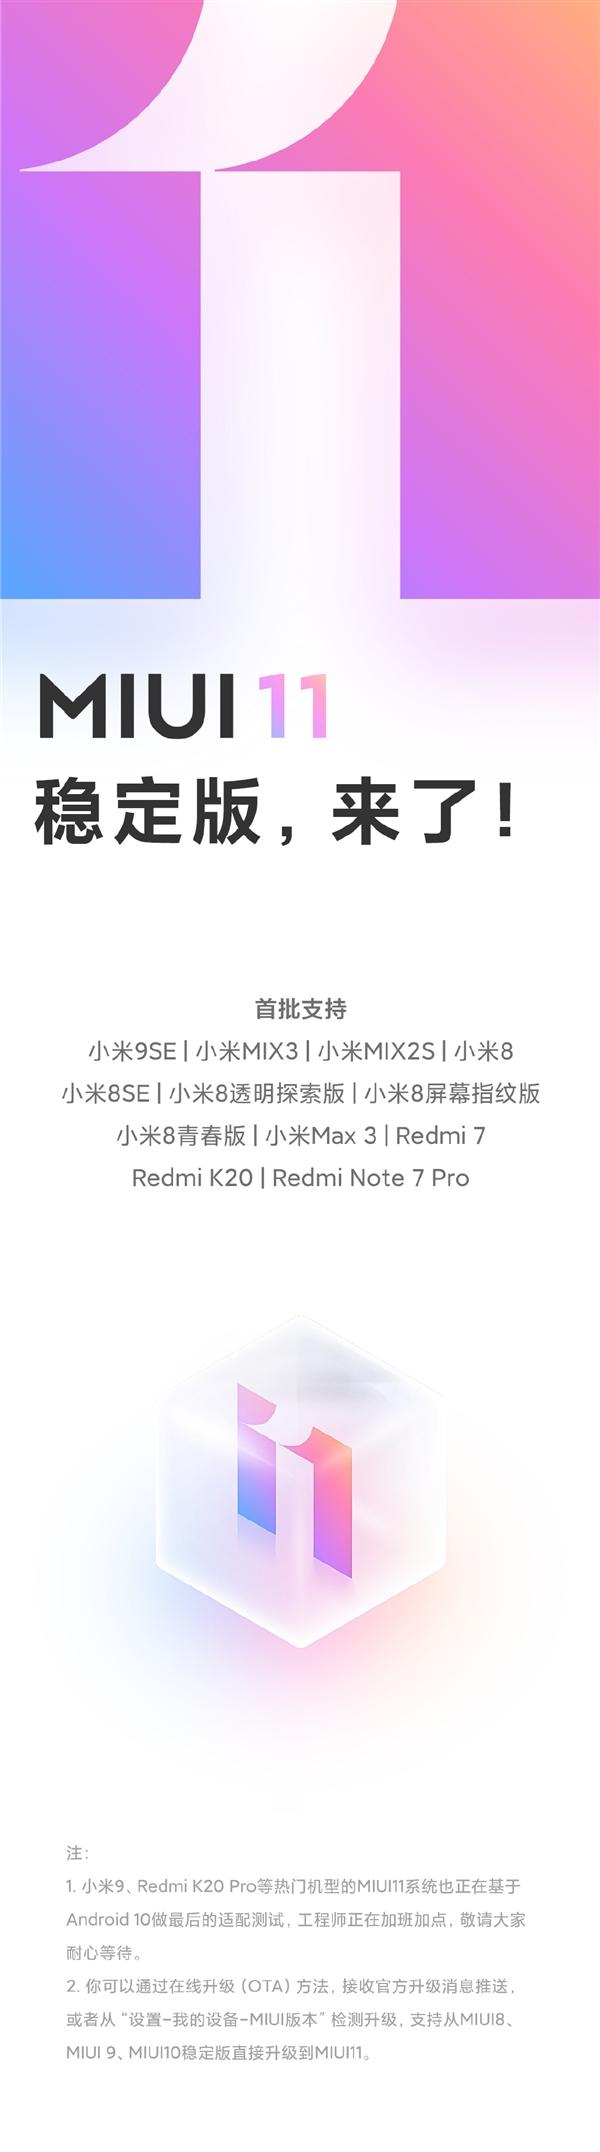 MIUI 11稳定版来了:首批支持12款小米/Redmi机型